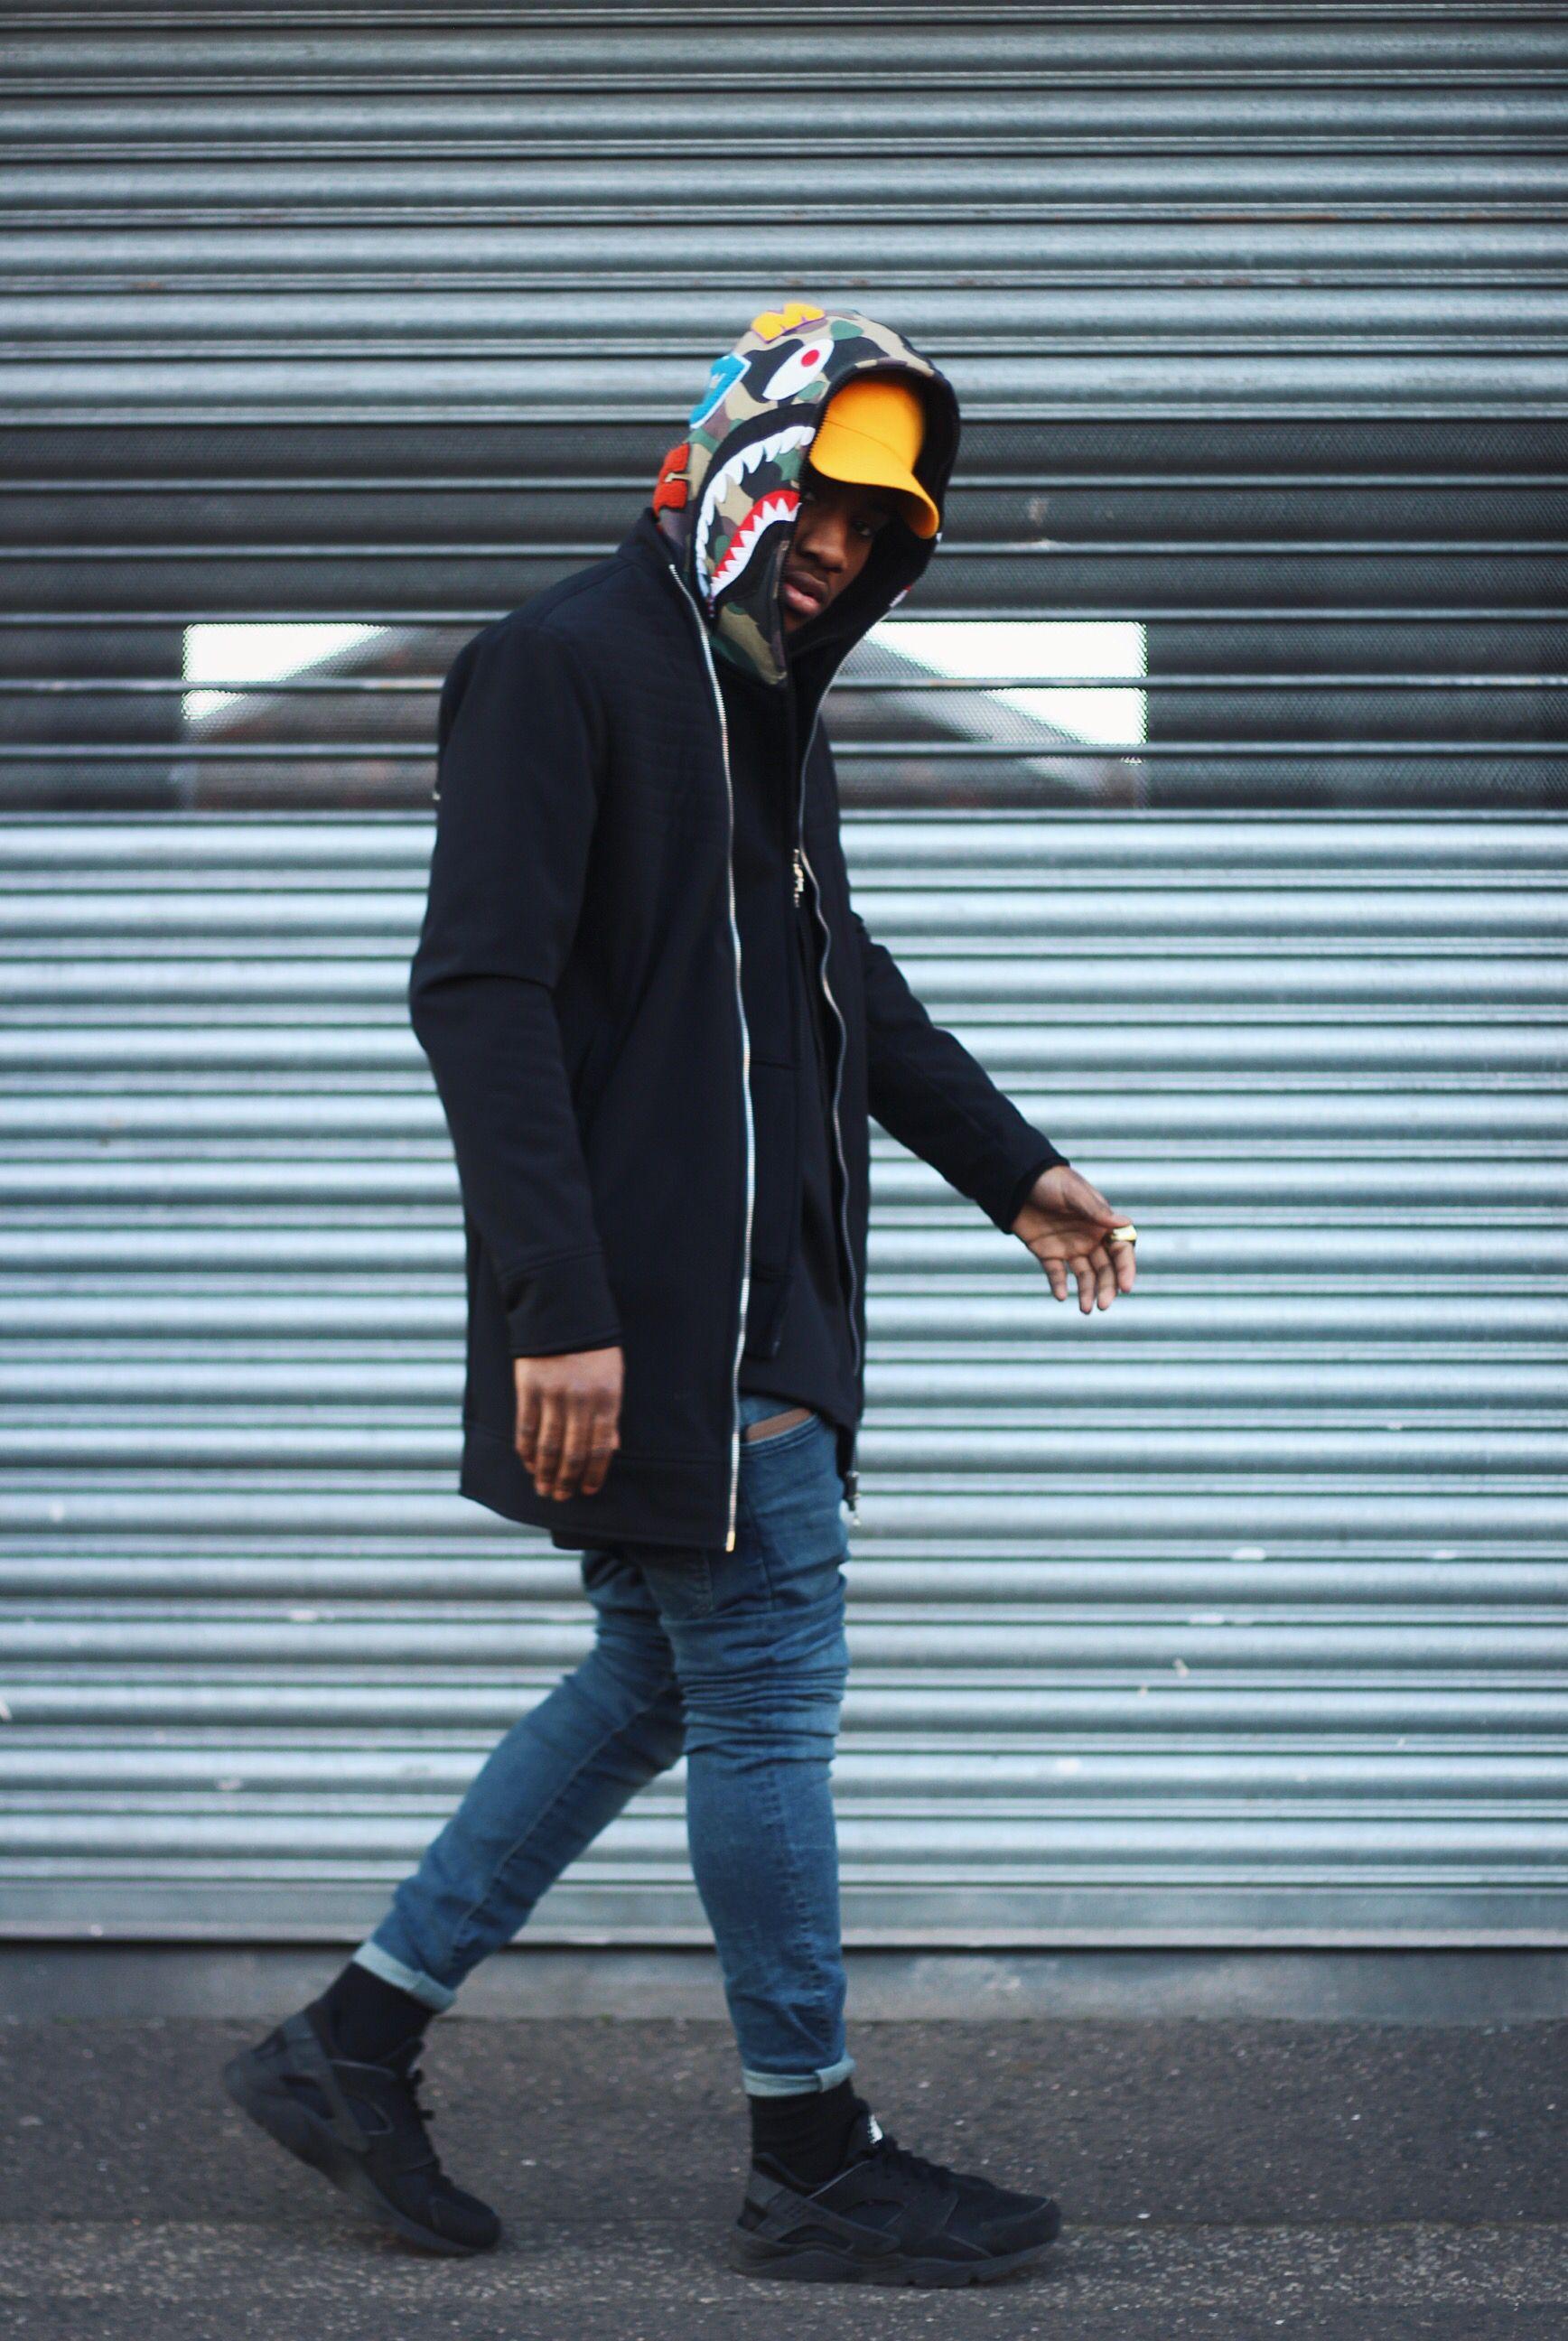 IAmVitalle bape shark hoodie || Follow @filetlondon for more street style #filetlondon | URBAN ...